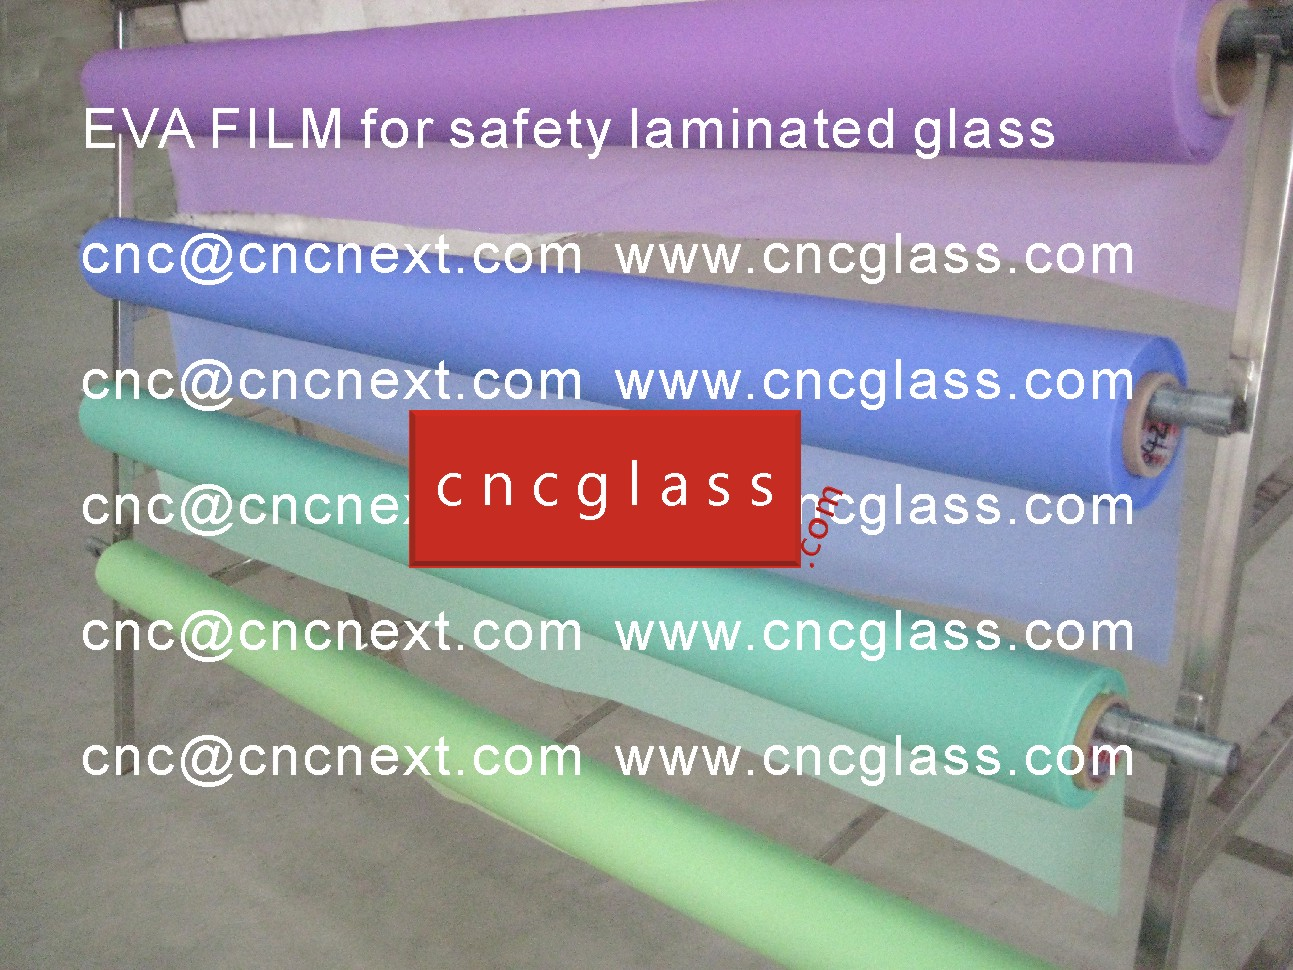 006 EVAFORCE EVA FILM FOR SAFETY LAMINATED GLASS